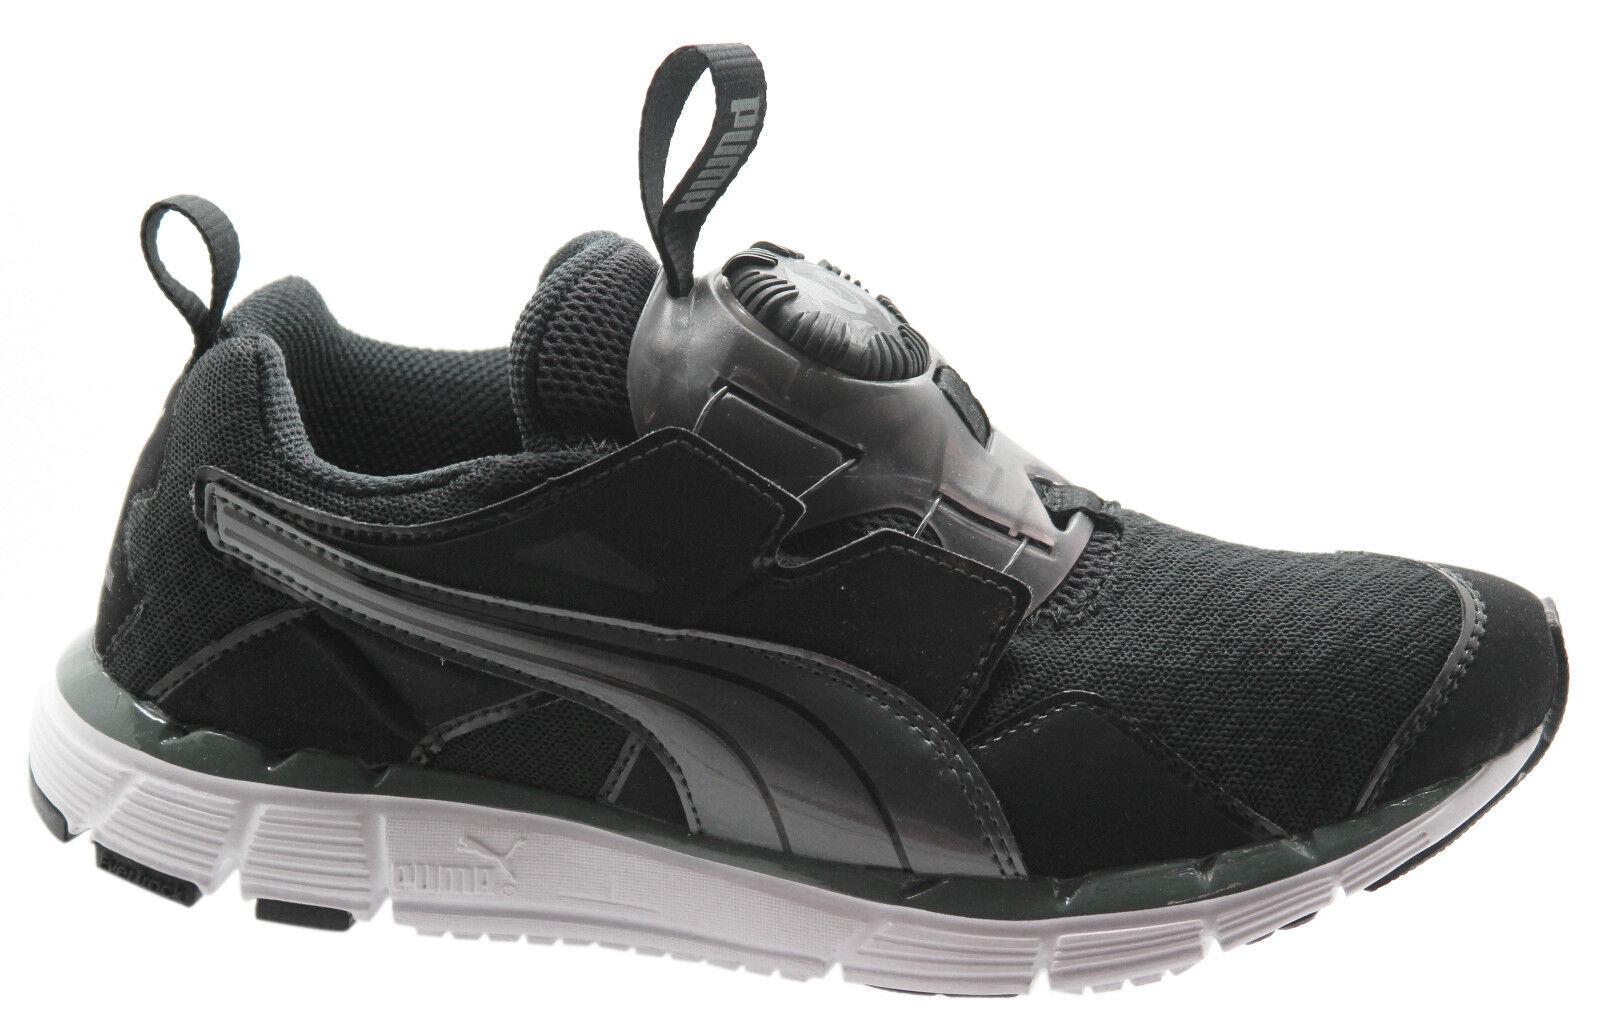 Puma ligero futuro correr disco ltwt zapatillas unisex para correr futuro ligero 429fc6